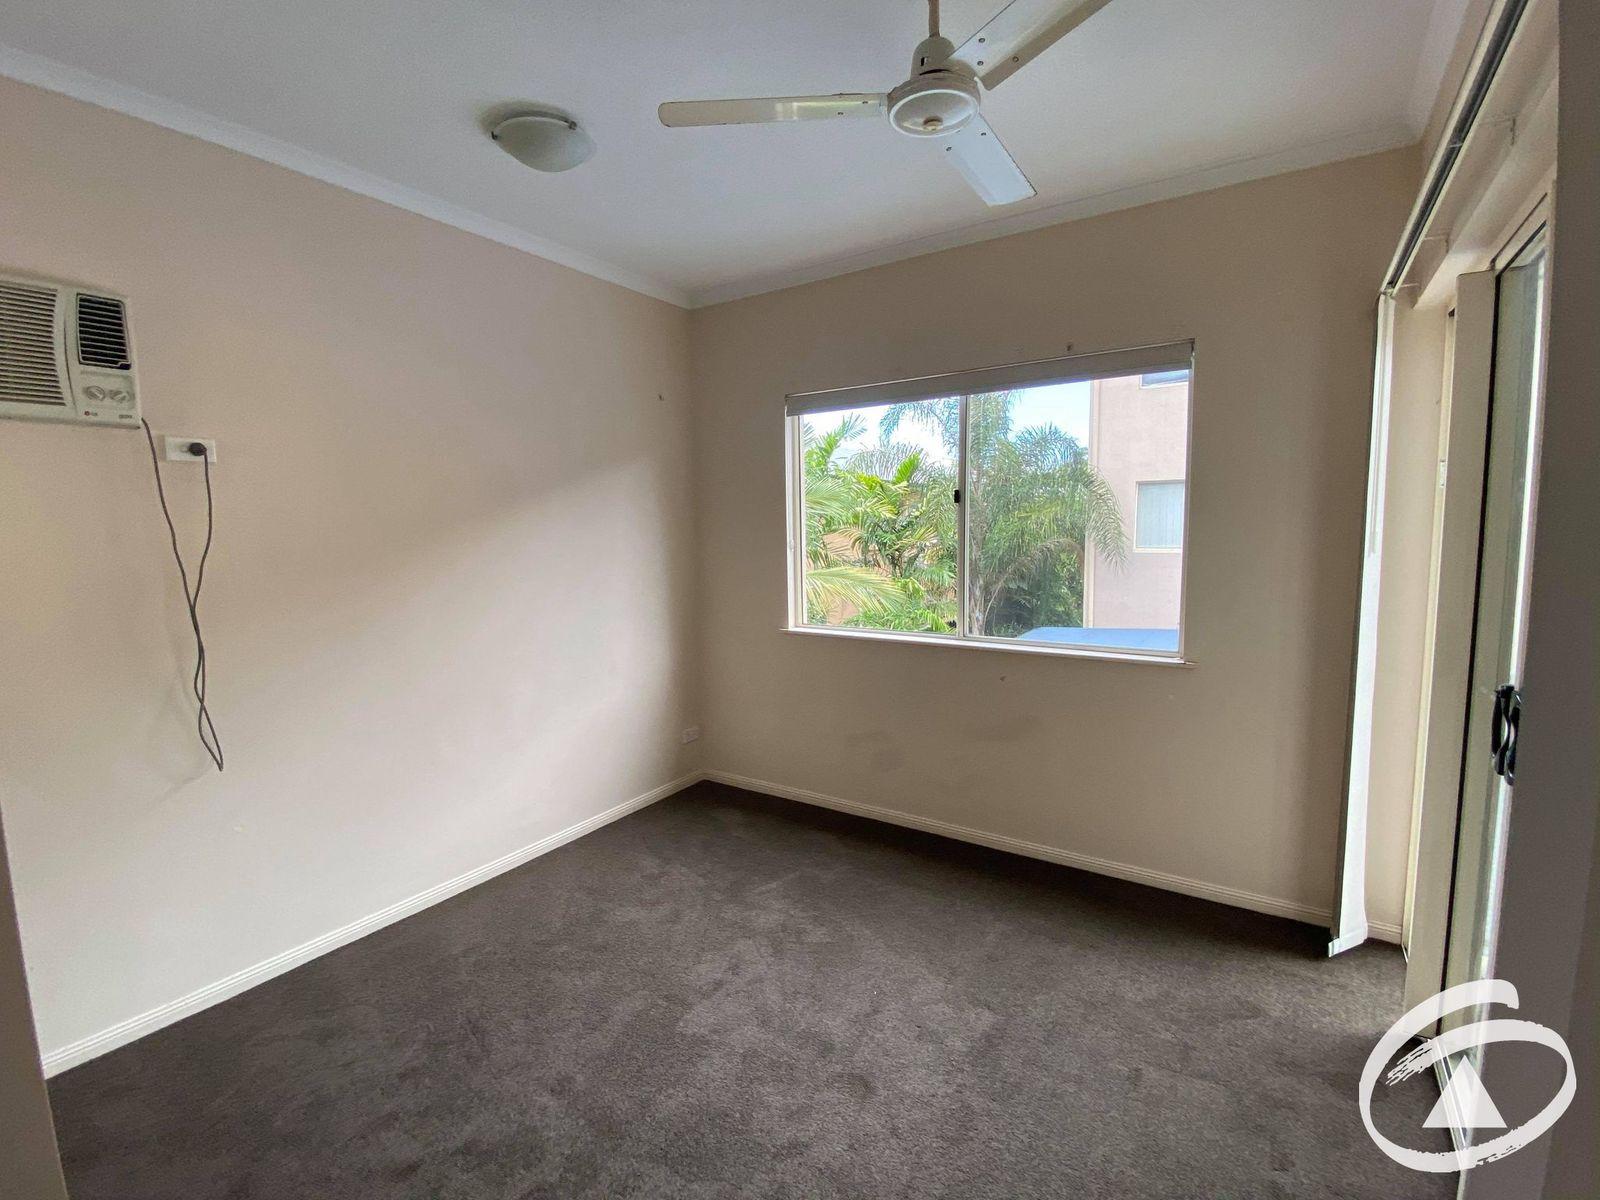 207/4 Grantala Street, Manoora, QLD 4870